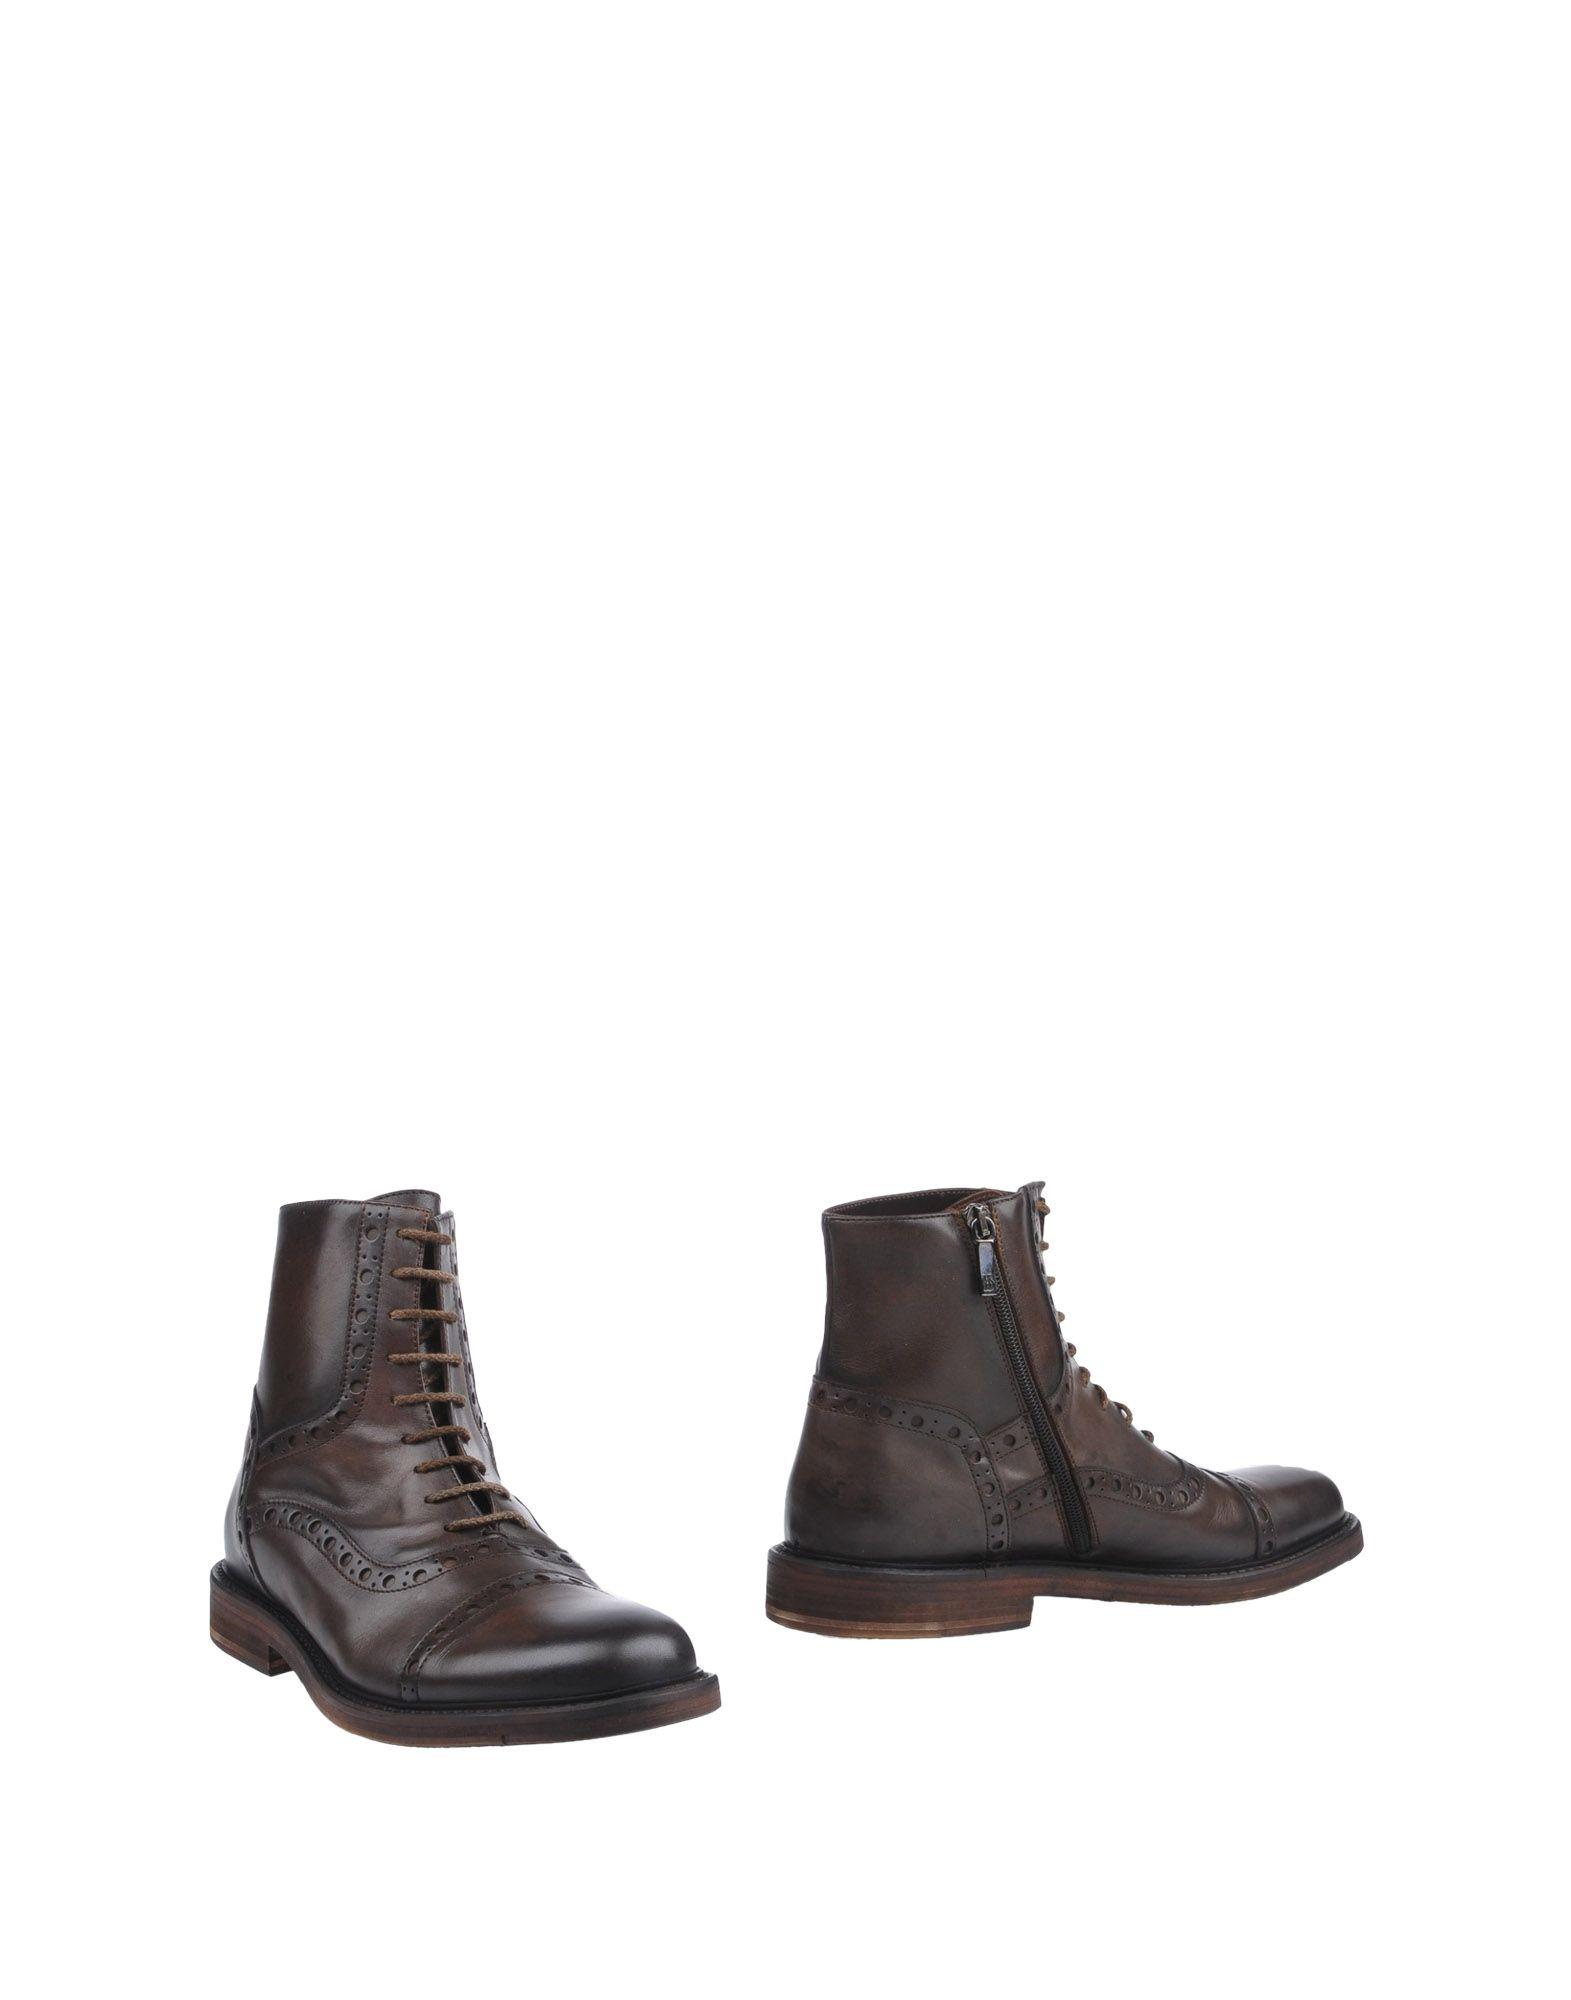 ROBERTO BOTTICELLI Полусапоги и высокие ботинки roberto botticelli br6154p